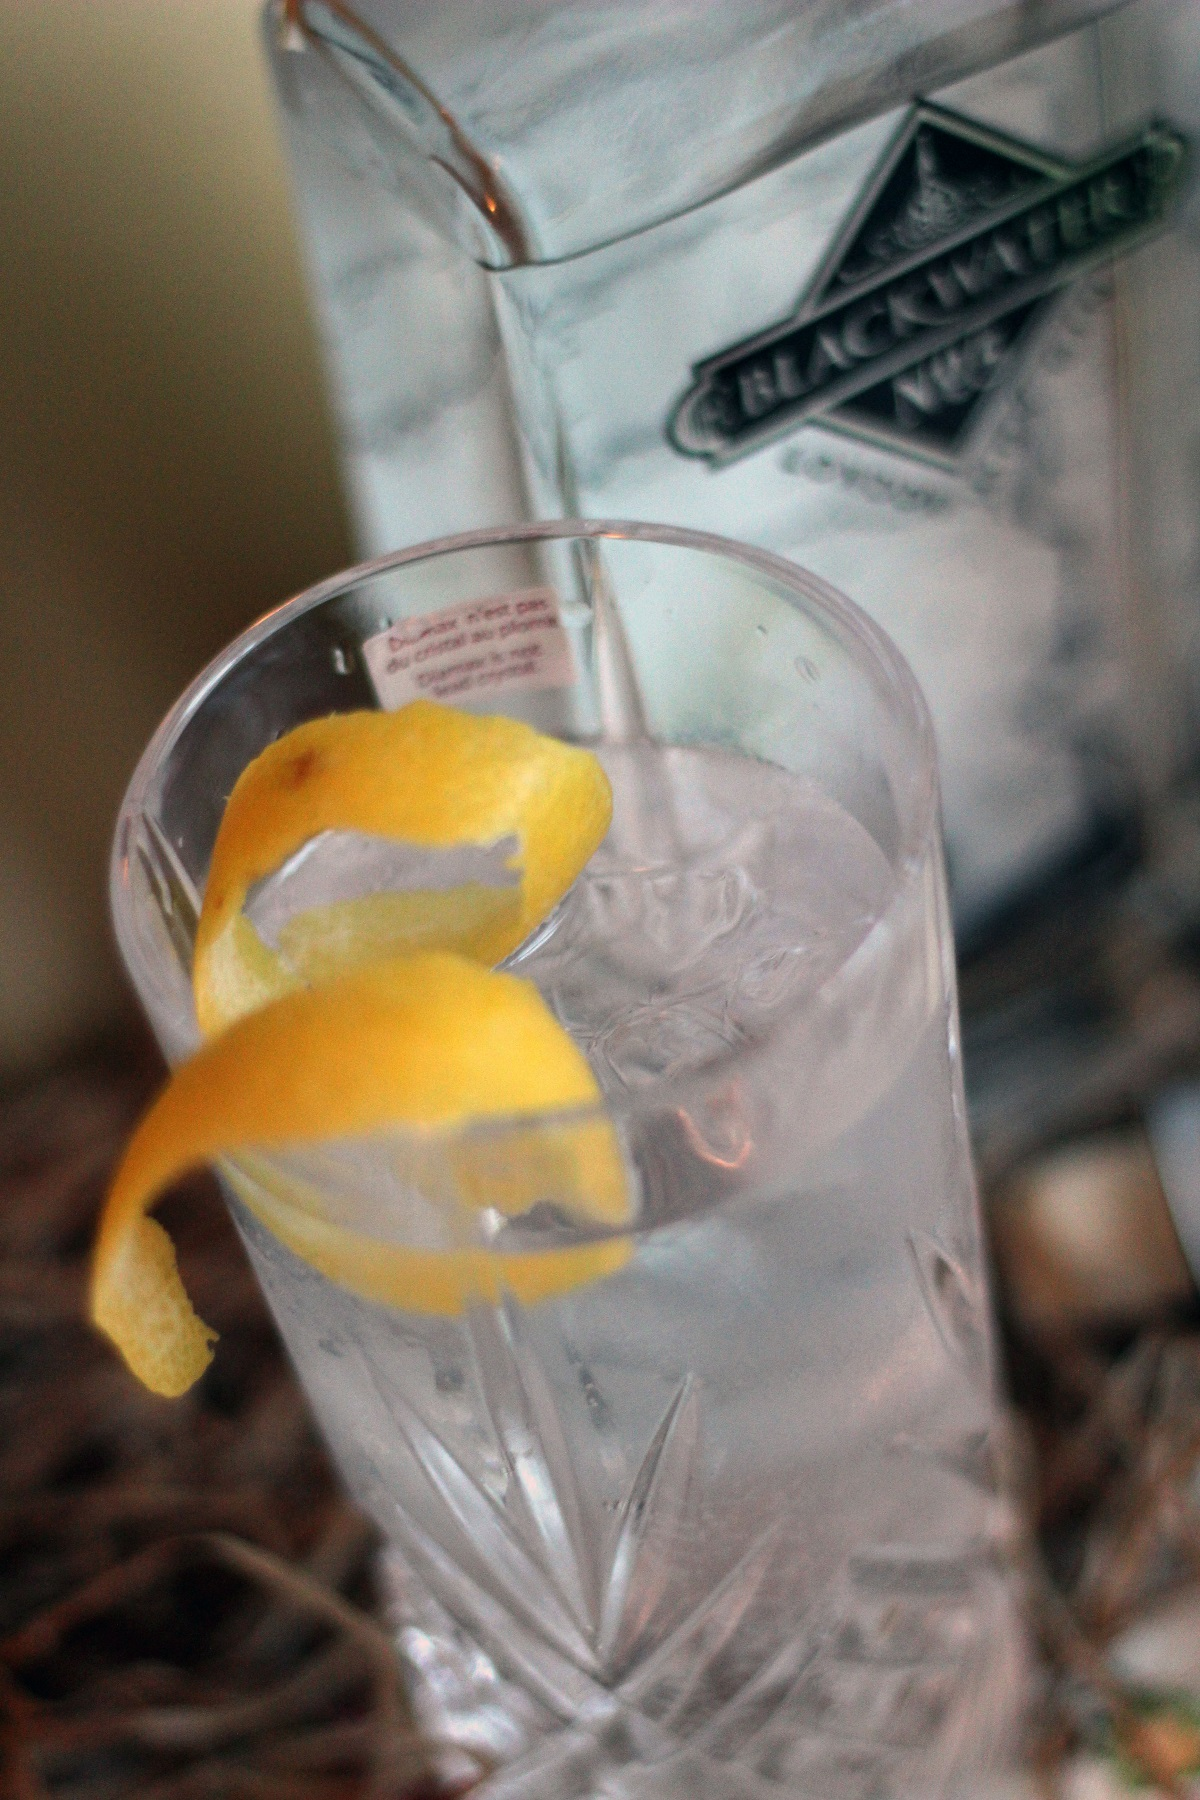 Blackwater Distillery's Nº 5 London Dry Gin